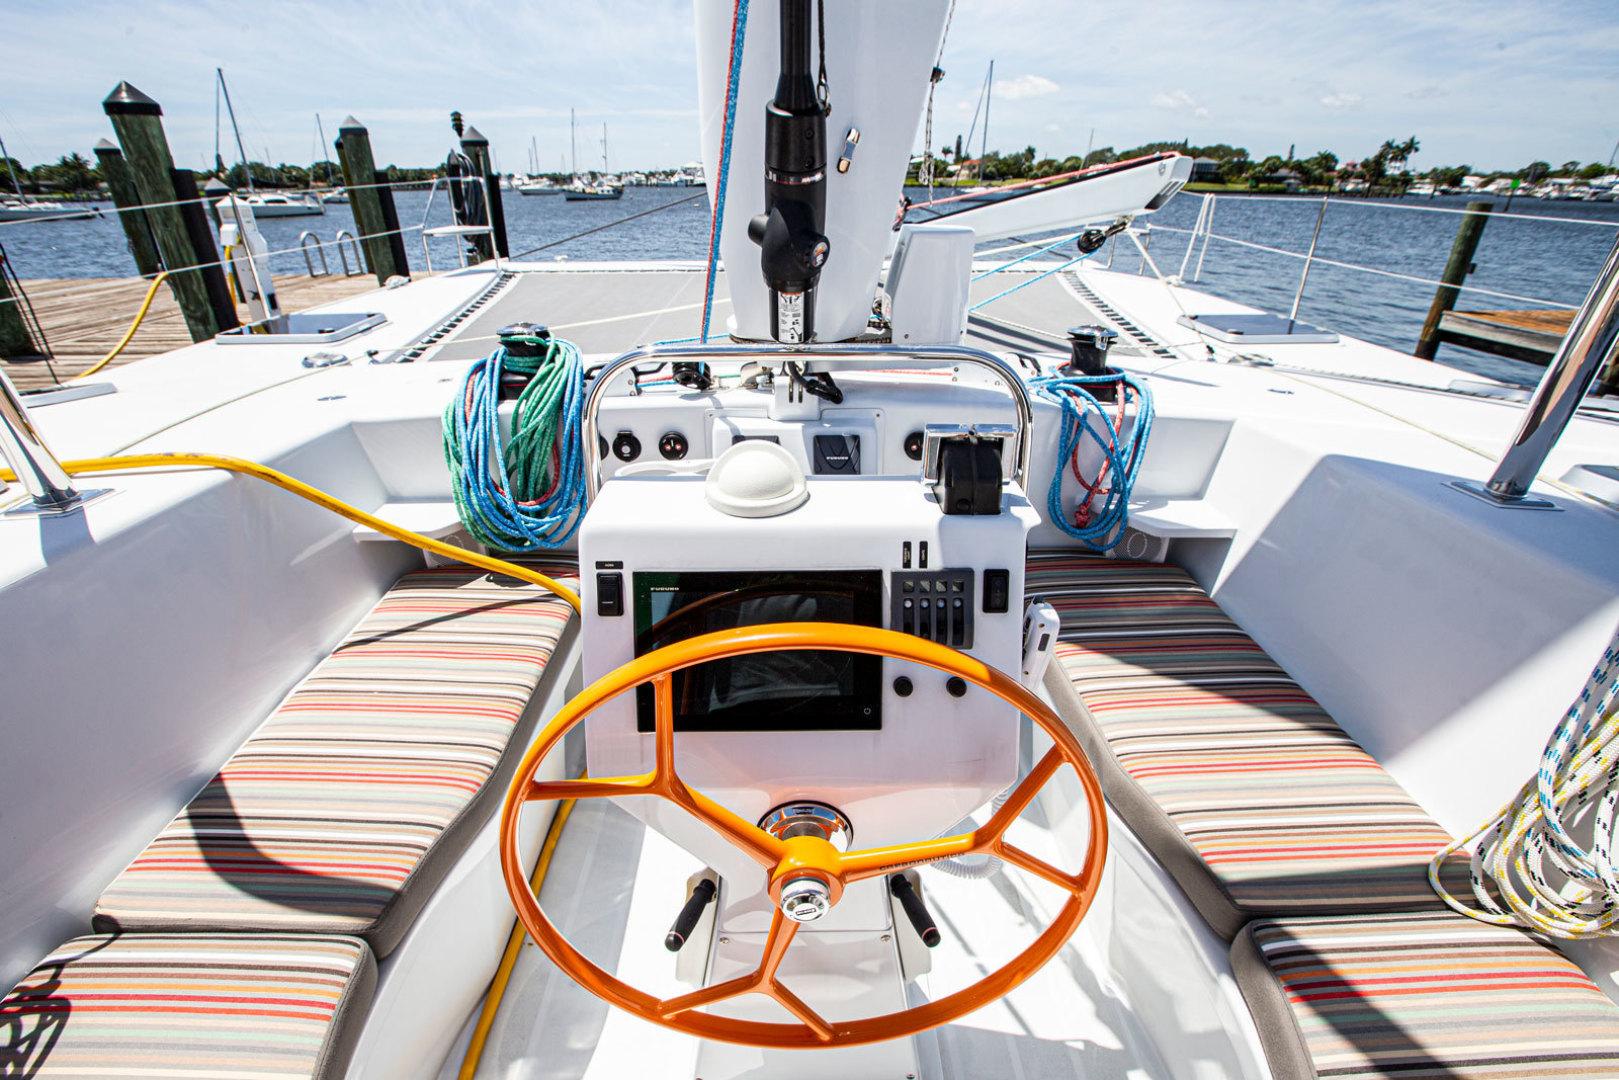 Atlantic-49 Catamaran 2018-Wabi Sabi Stuart-Florida-United States-1399297 | Thumbnail